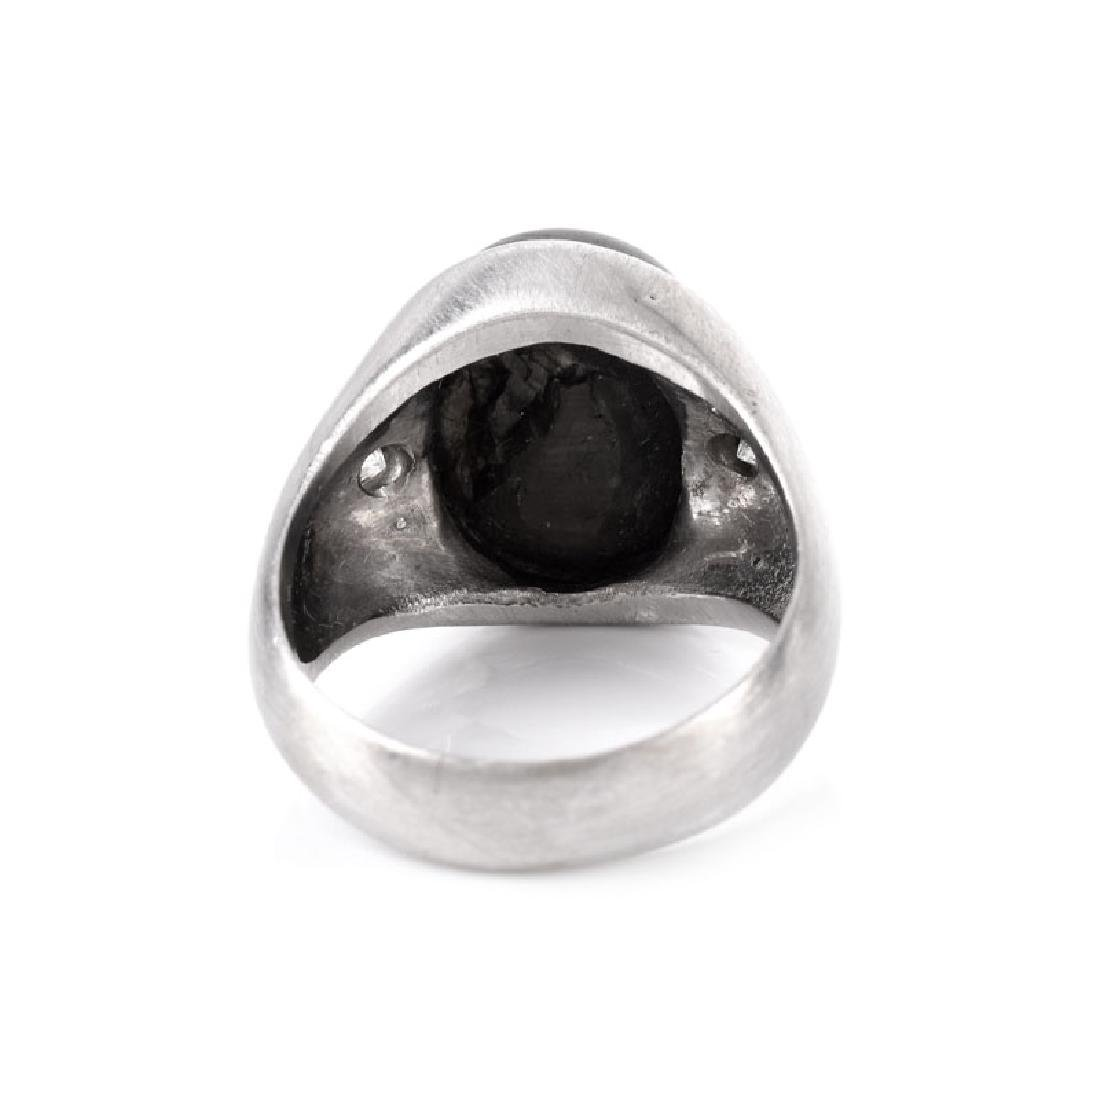 Man's Vintage Approx. 12.0 Carat Black Star Sapphire, - 3